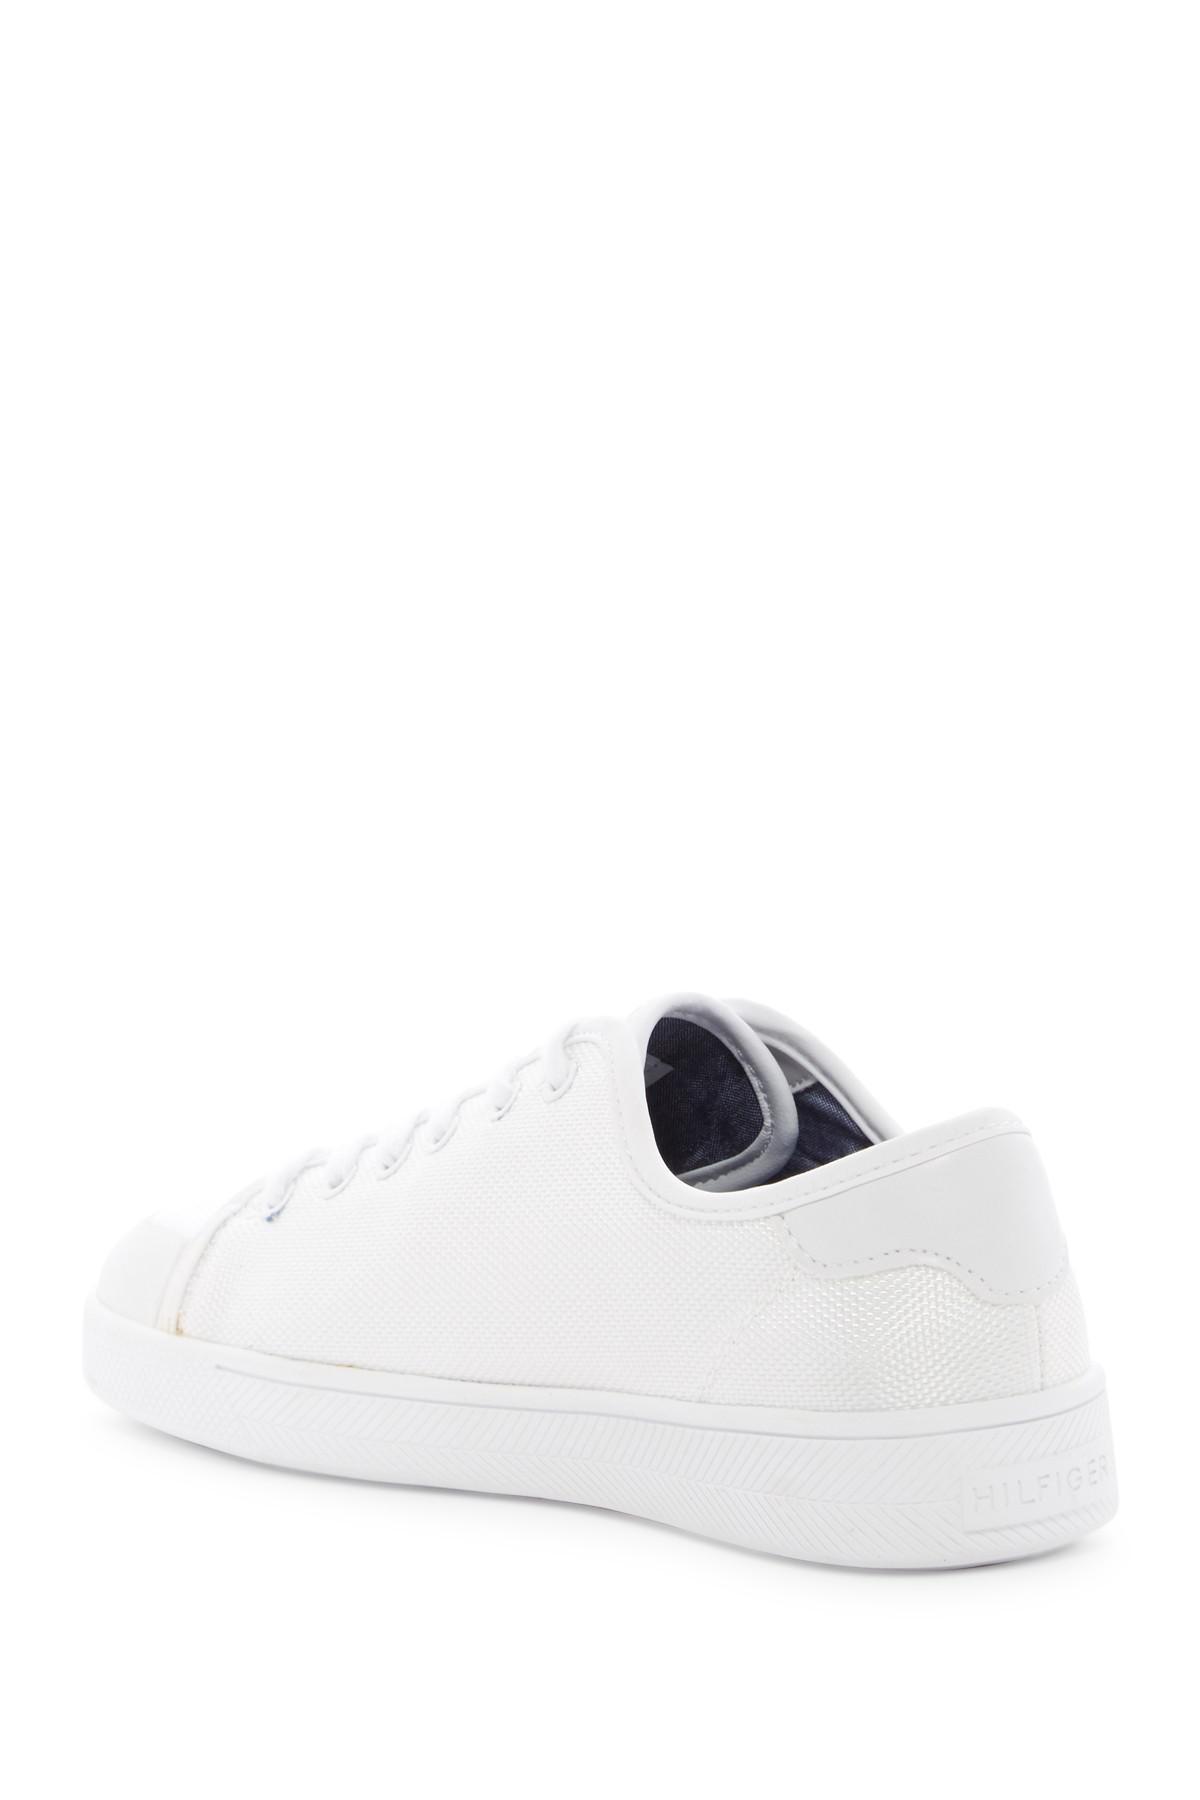 19c38a8d7594 Lyst - Tommy Hilfiger Spruce Platform Sneaker in White